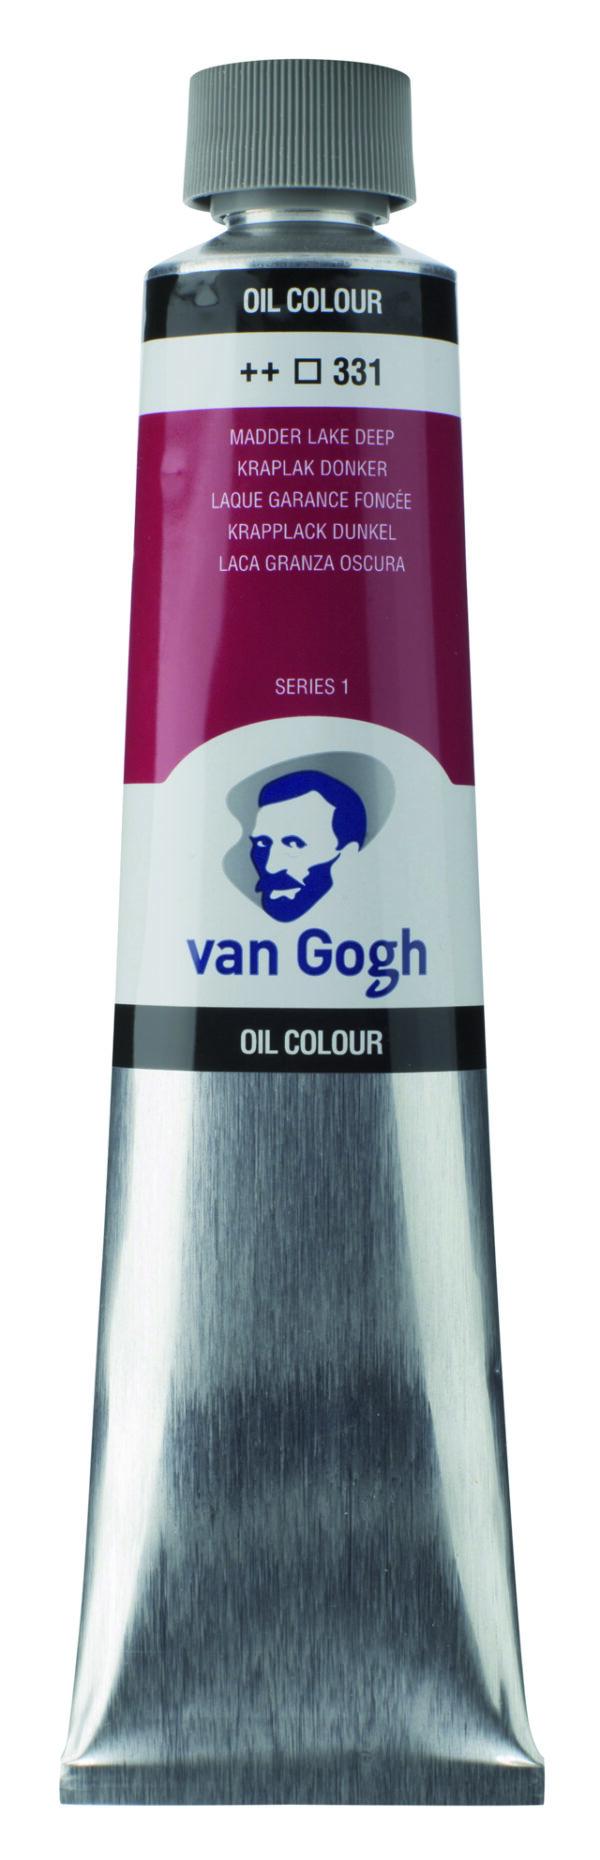 Van Gogh 331 Madder laker Deep - 200 ml